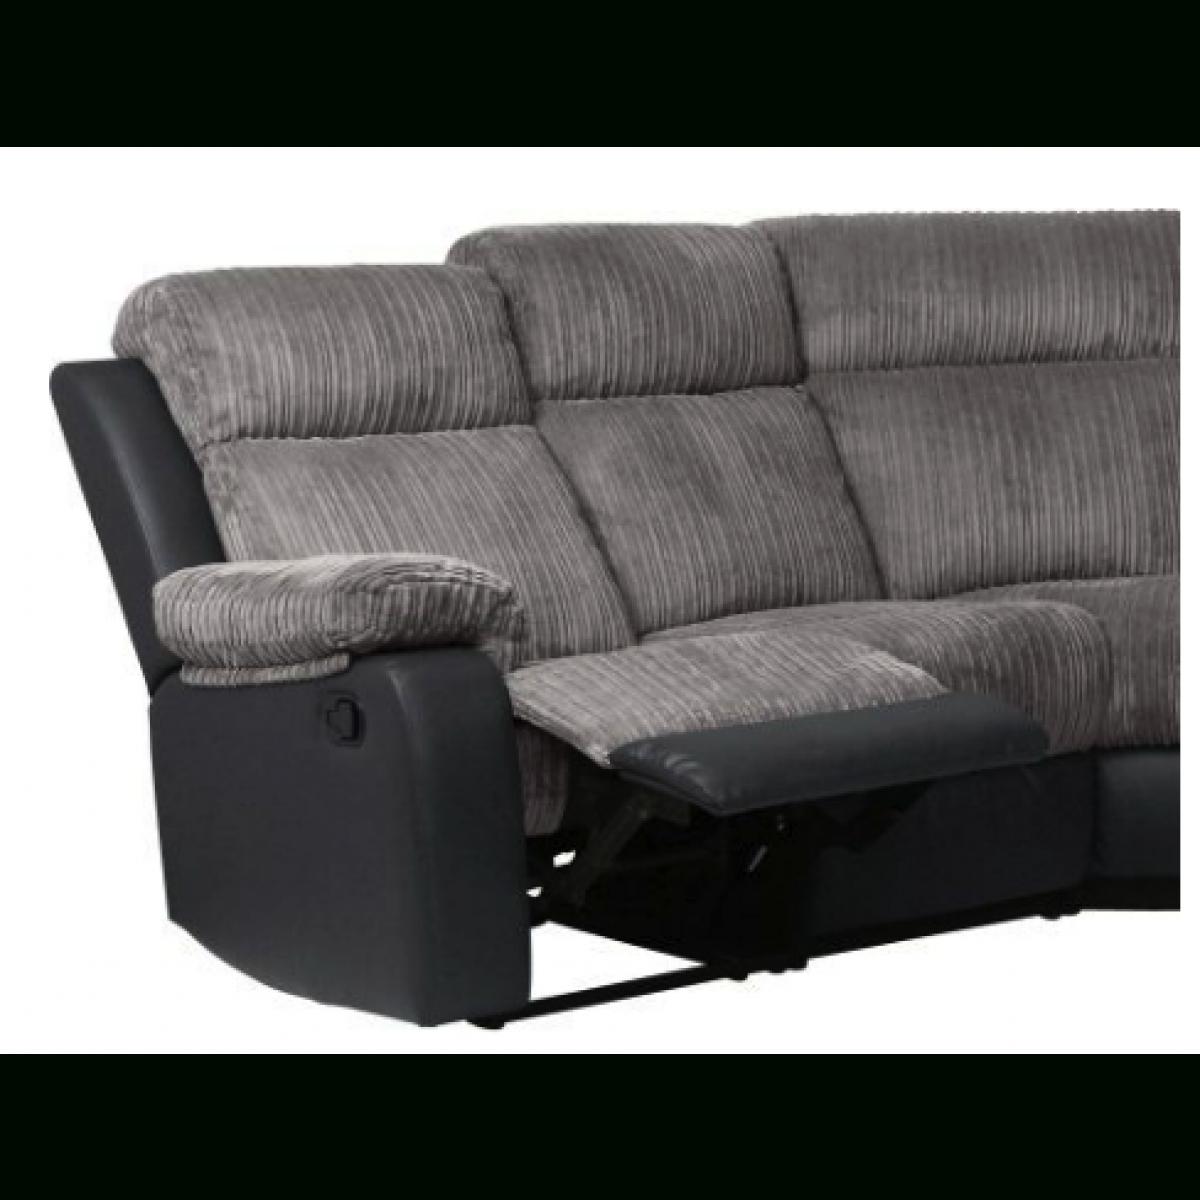 Bradley Fabric Recliner Corner Sofa Group – Charcoal – Furnico Village Throughout Fabric Corner Sofa Bed (Image 3 of 20)